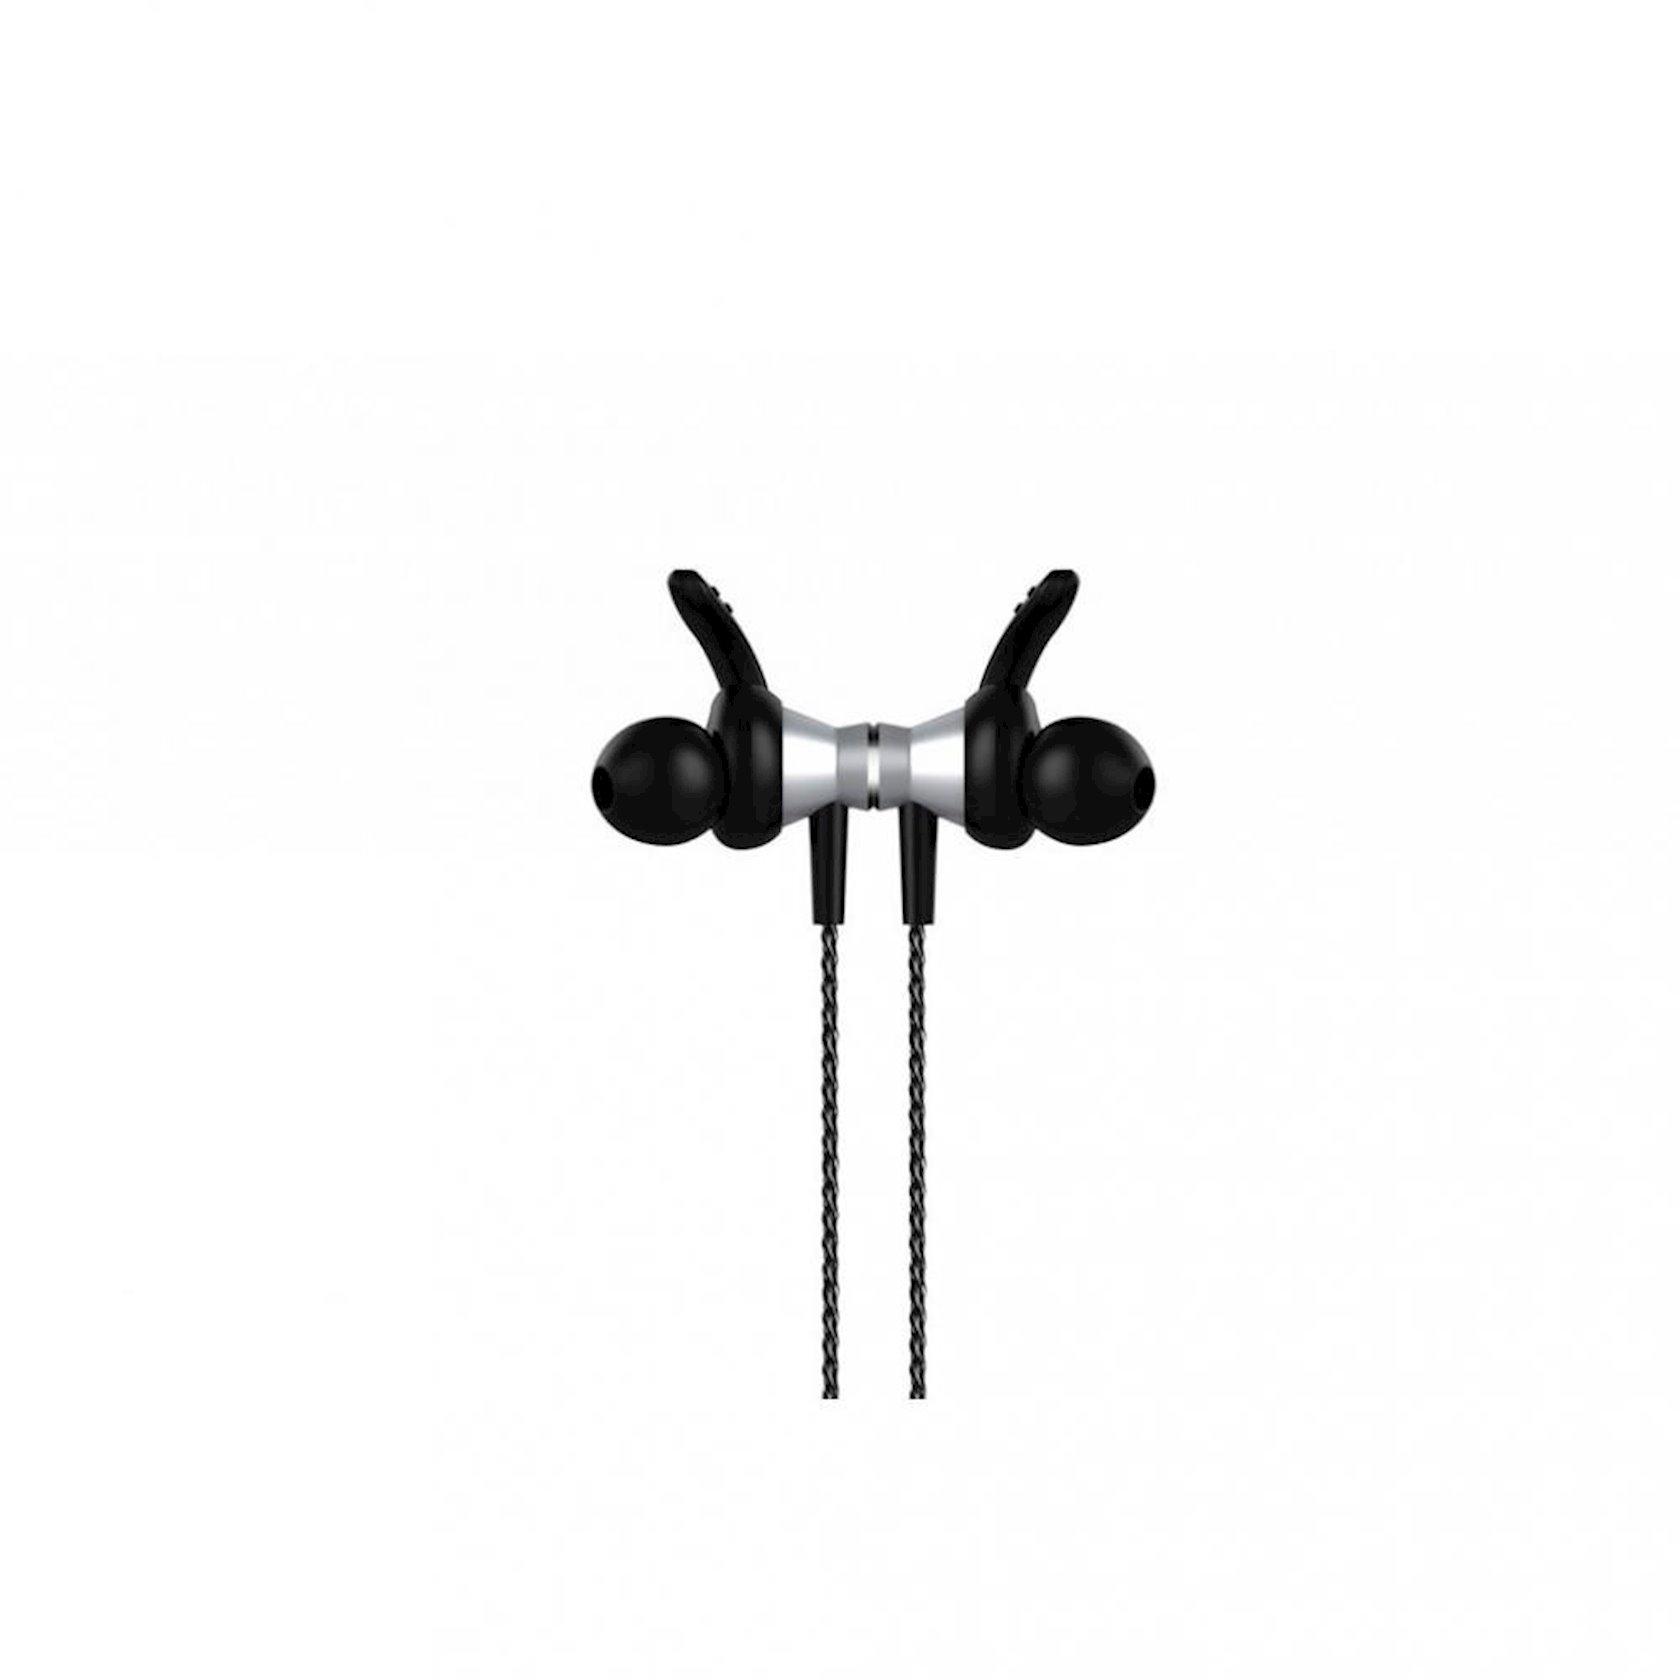 Simli qulaqlıqlar 2E Headphones S8 Piston Magnet Silver (2E-IES8SL)